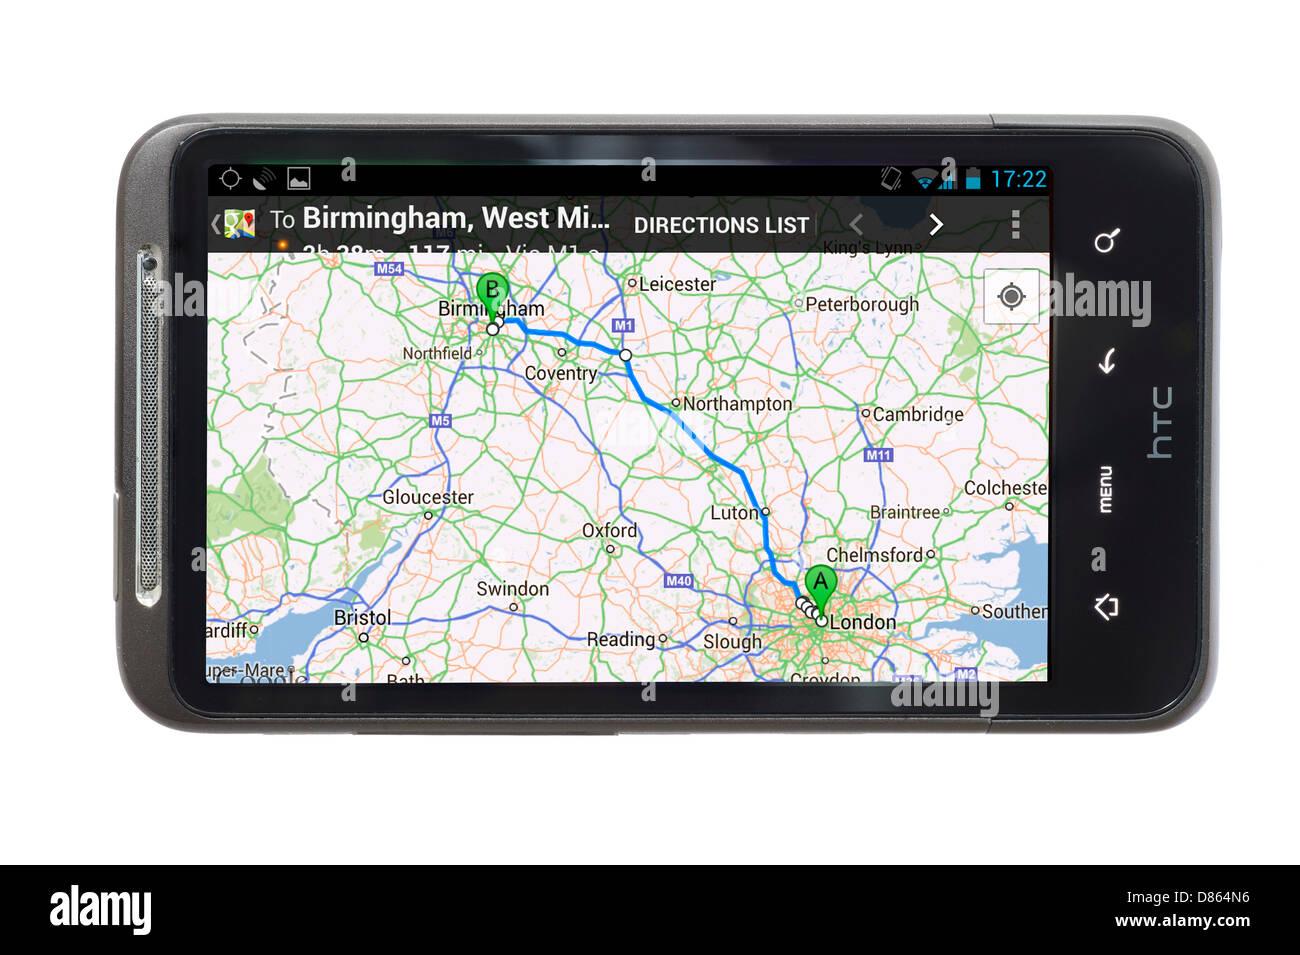 Google Maps on an HTC Smartphone, UK - Stock Image